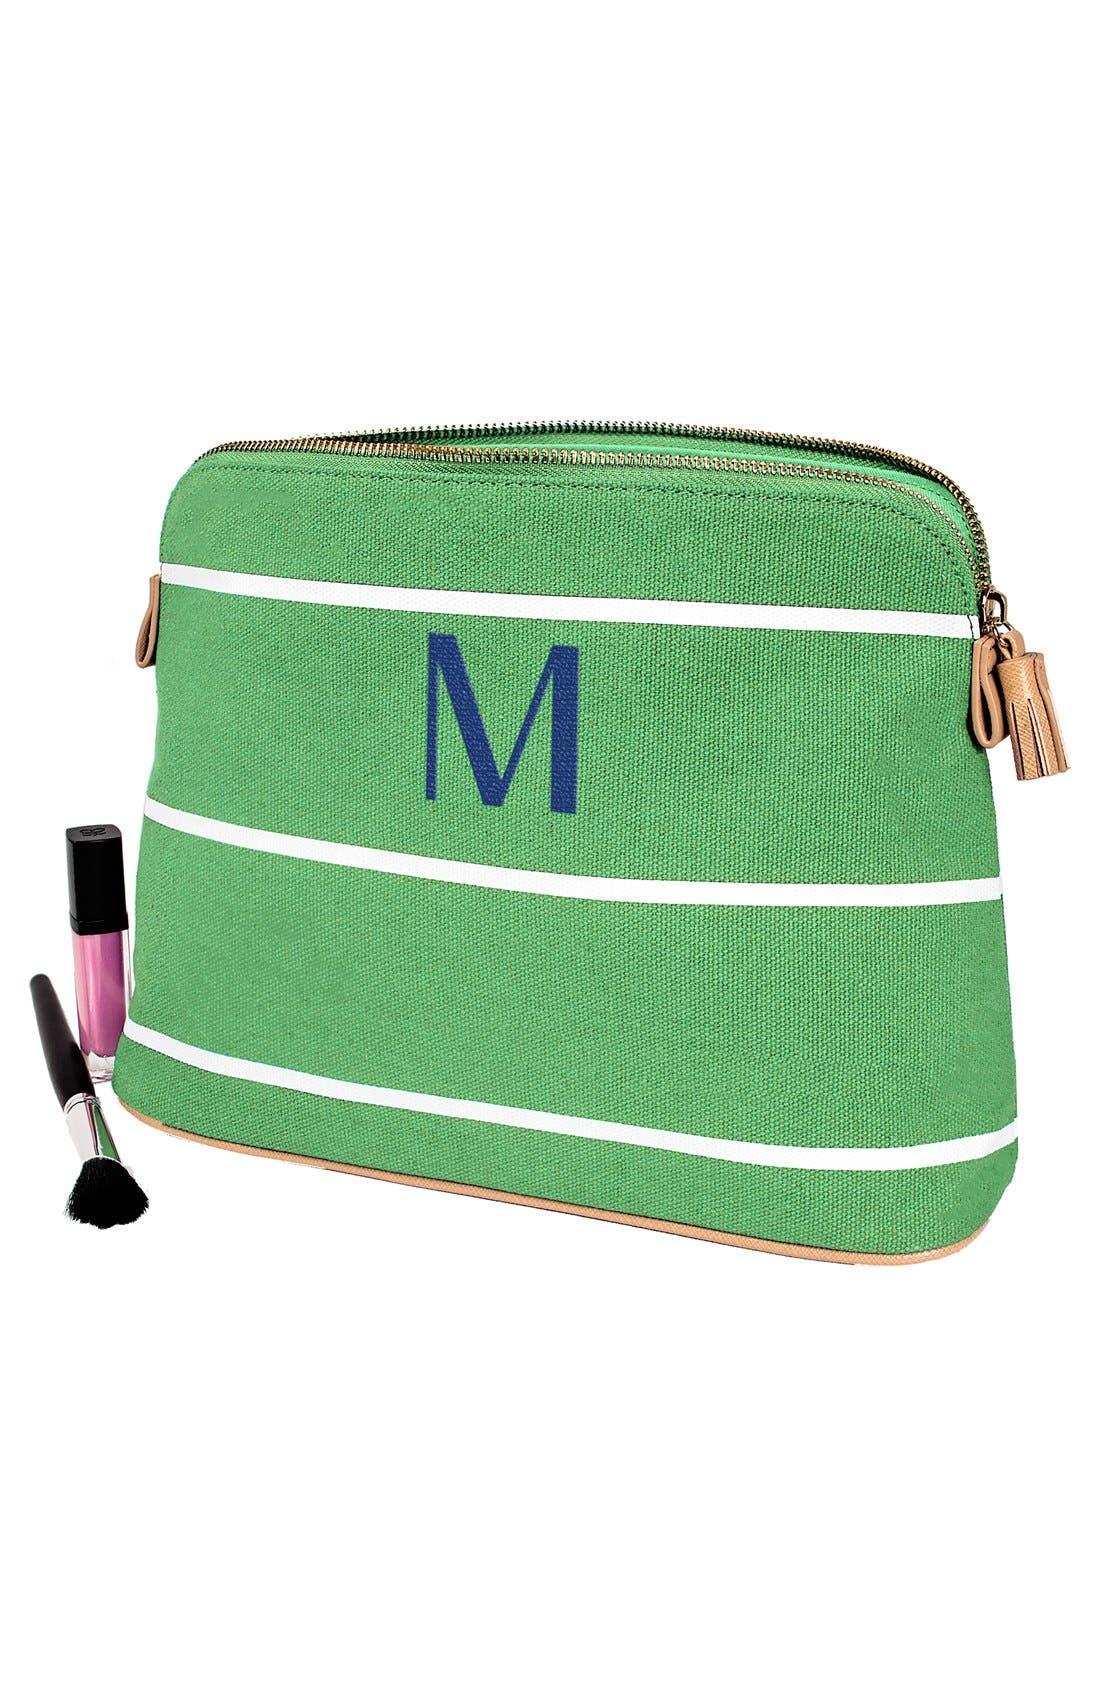 Monogram Cosmetics Bag,                             Alternate thumbnail 2, color,